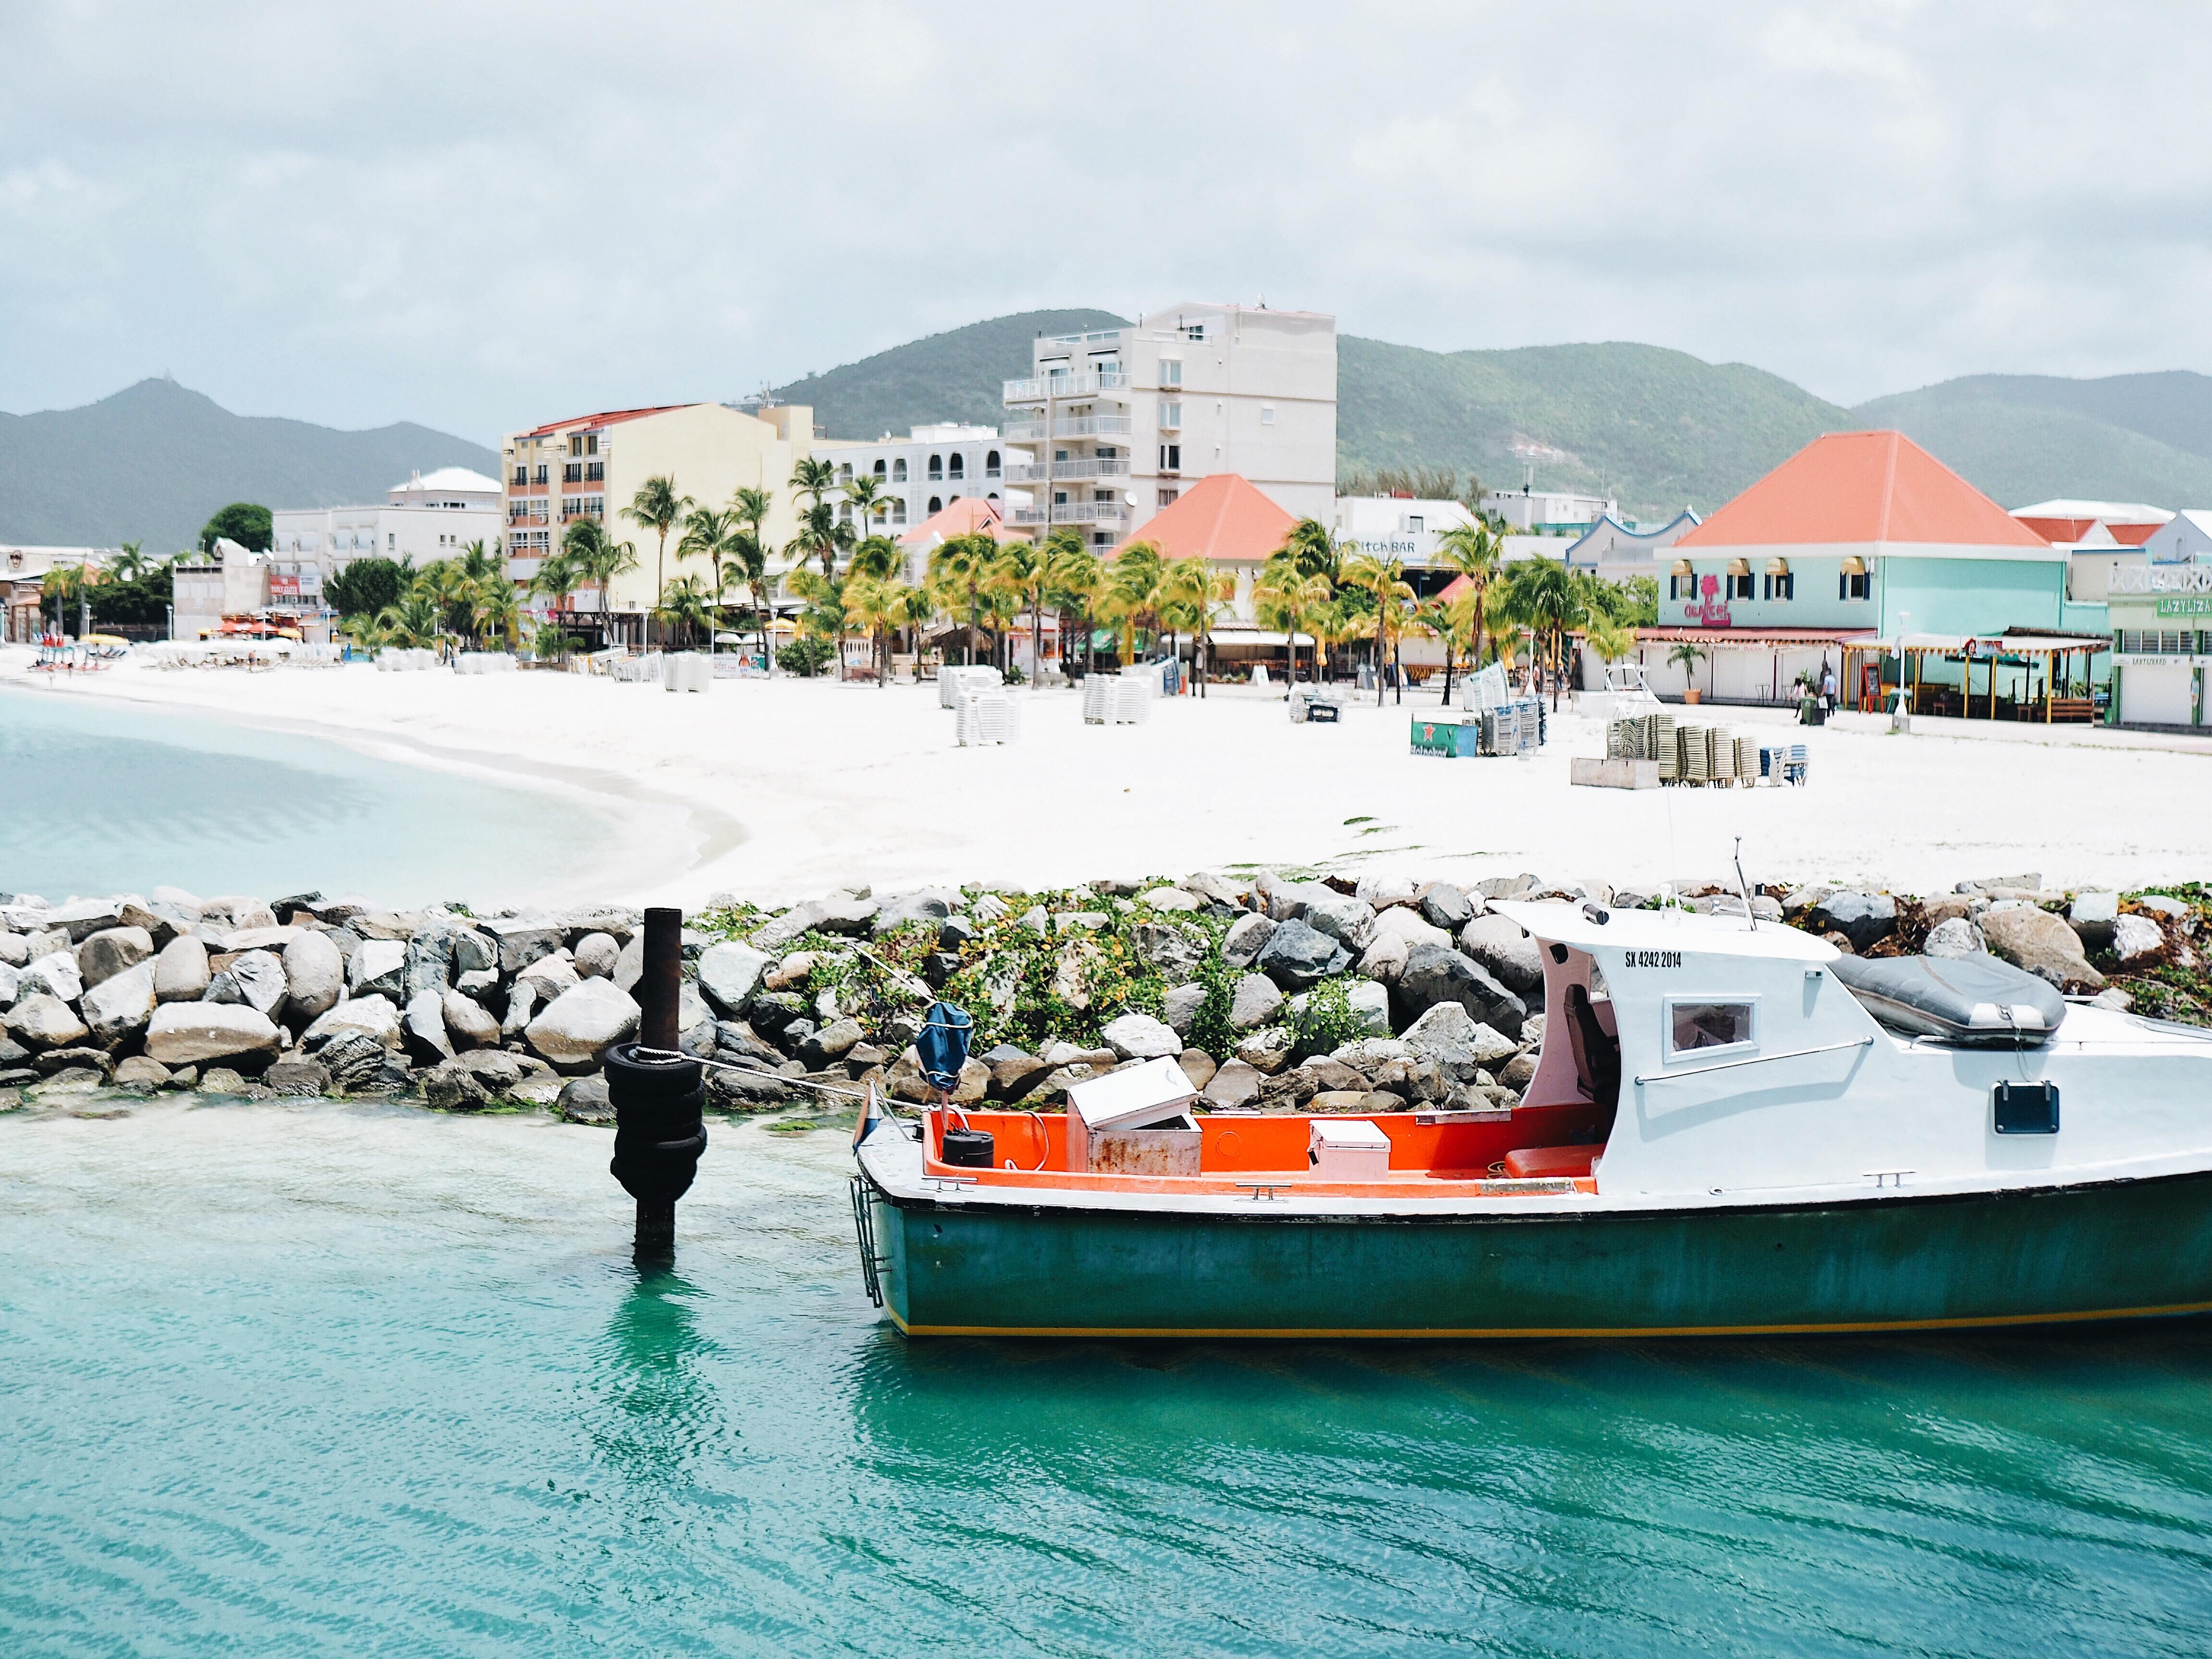 St. Maarten ferry dock